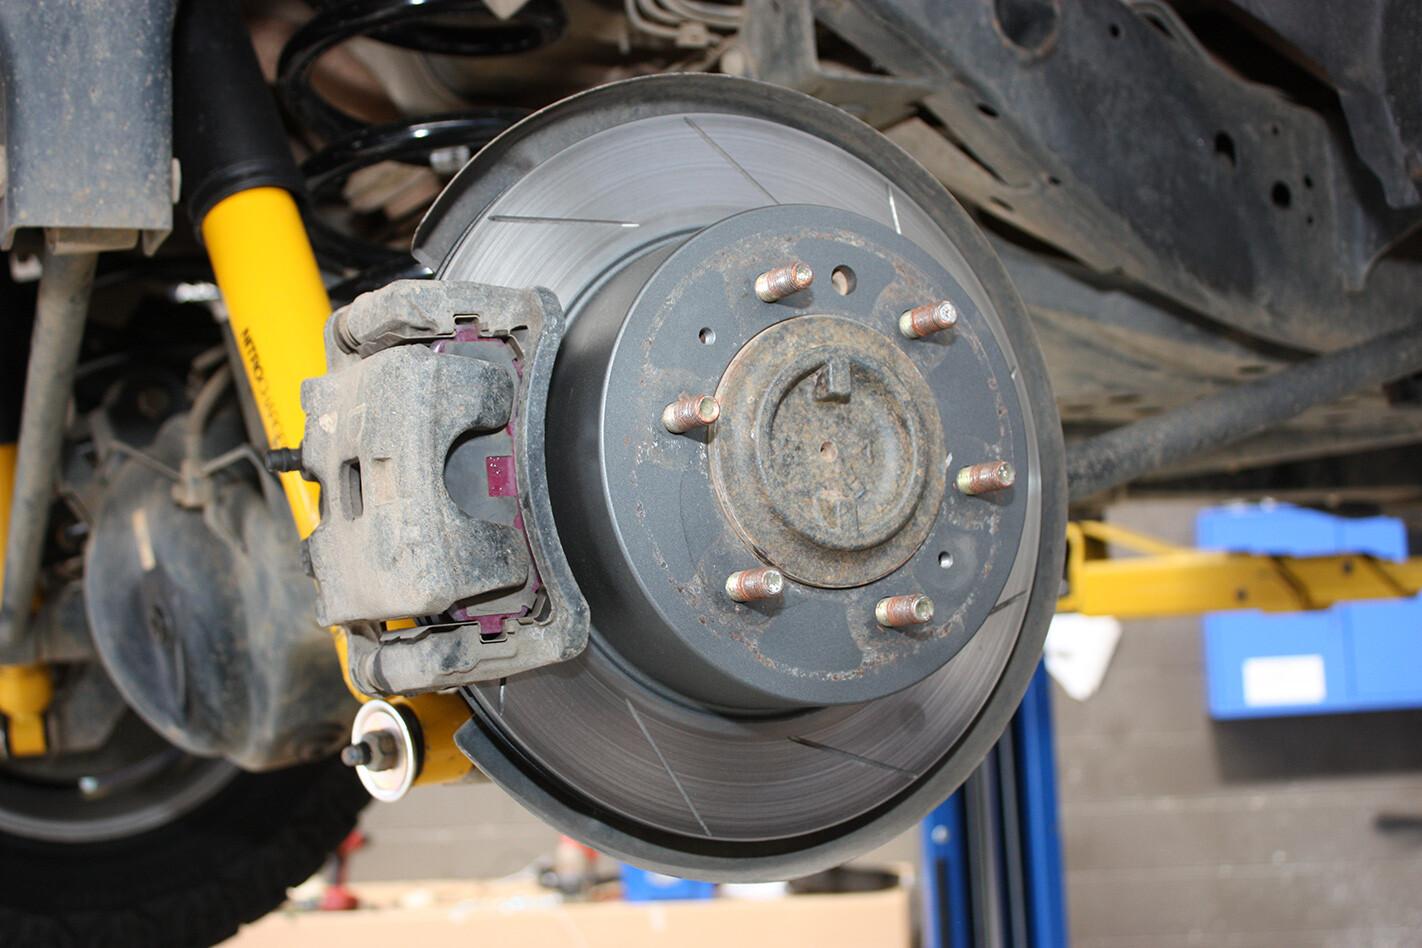 Nissan GU Patrol tourer rotors